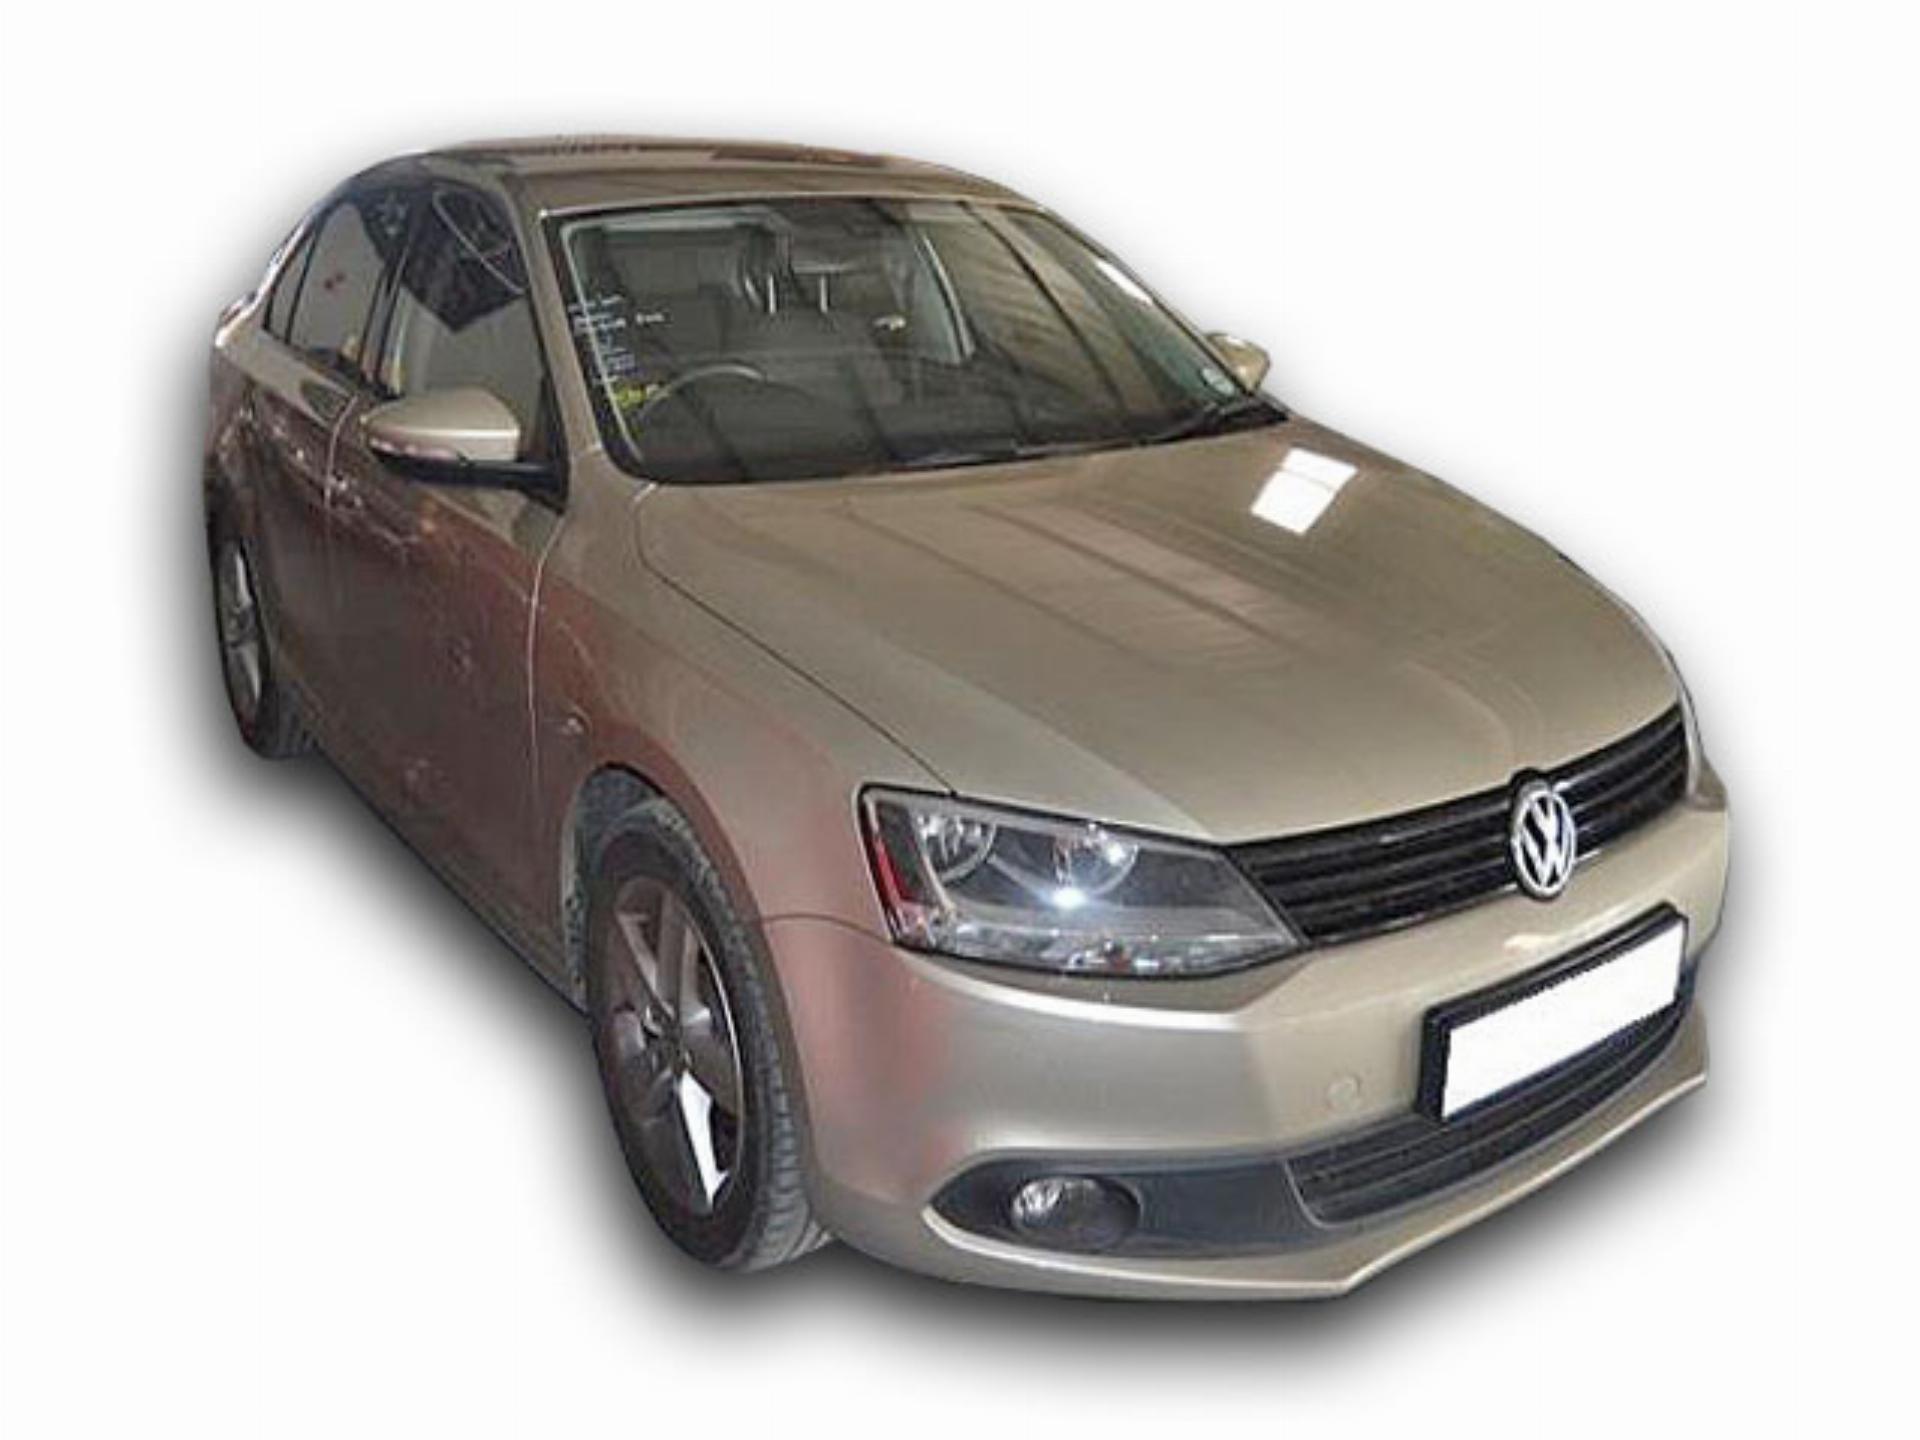 Volkswagen Jetta 5 1.2 Tsi